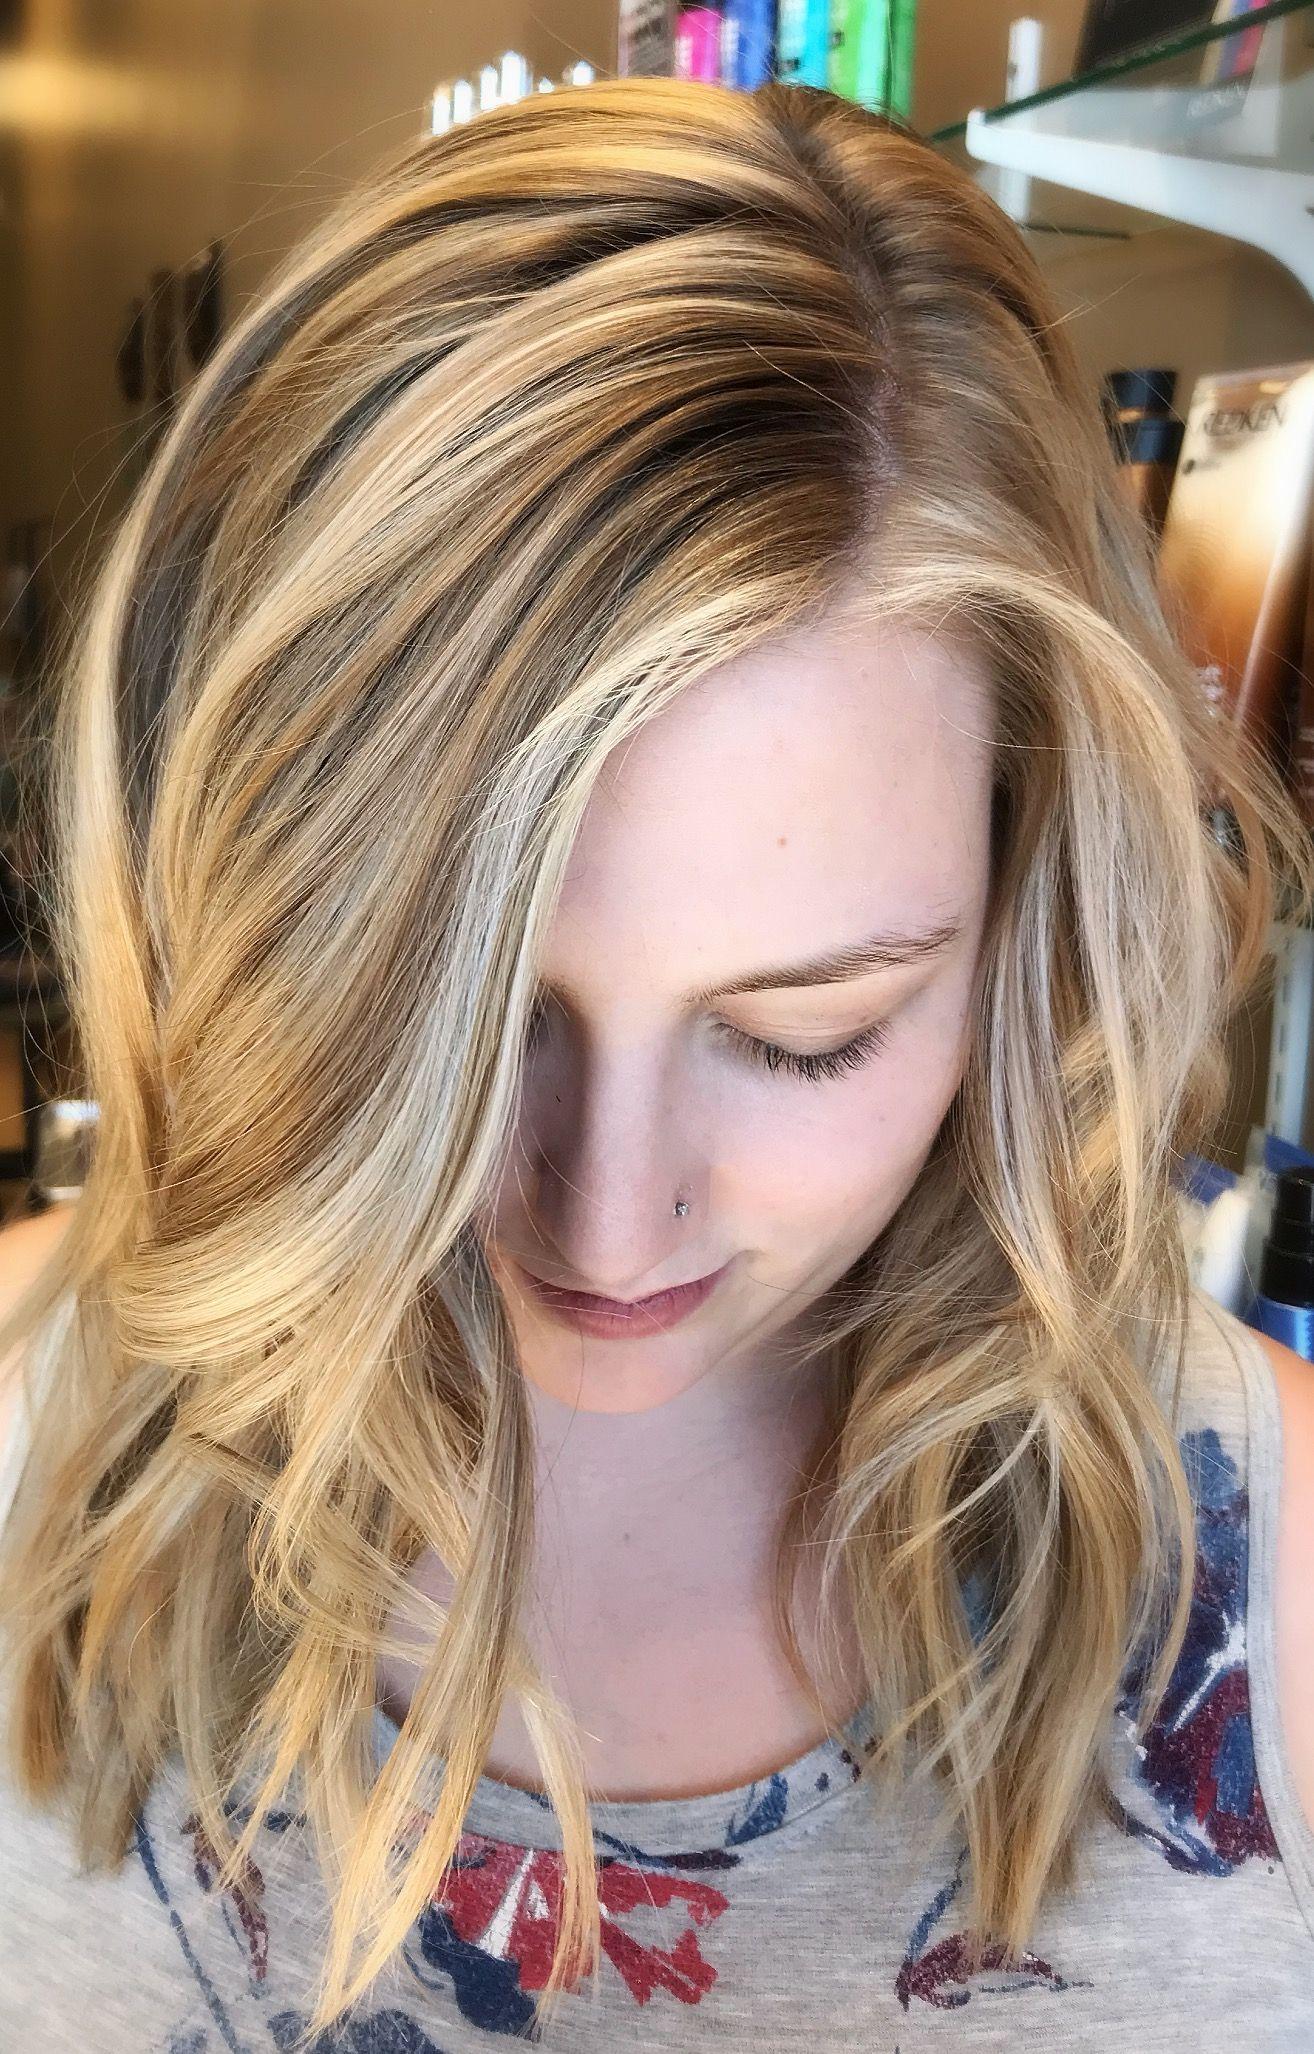 Pin By Mads On Hairstyles Haircolor Make Up And Nails